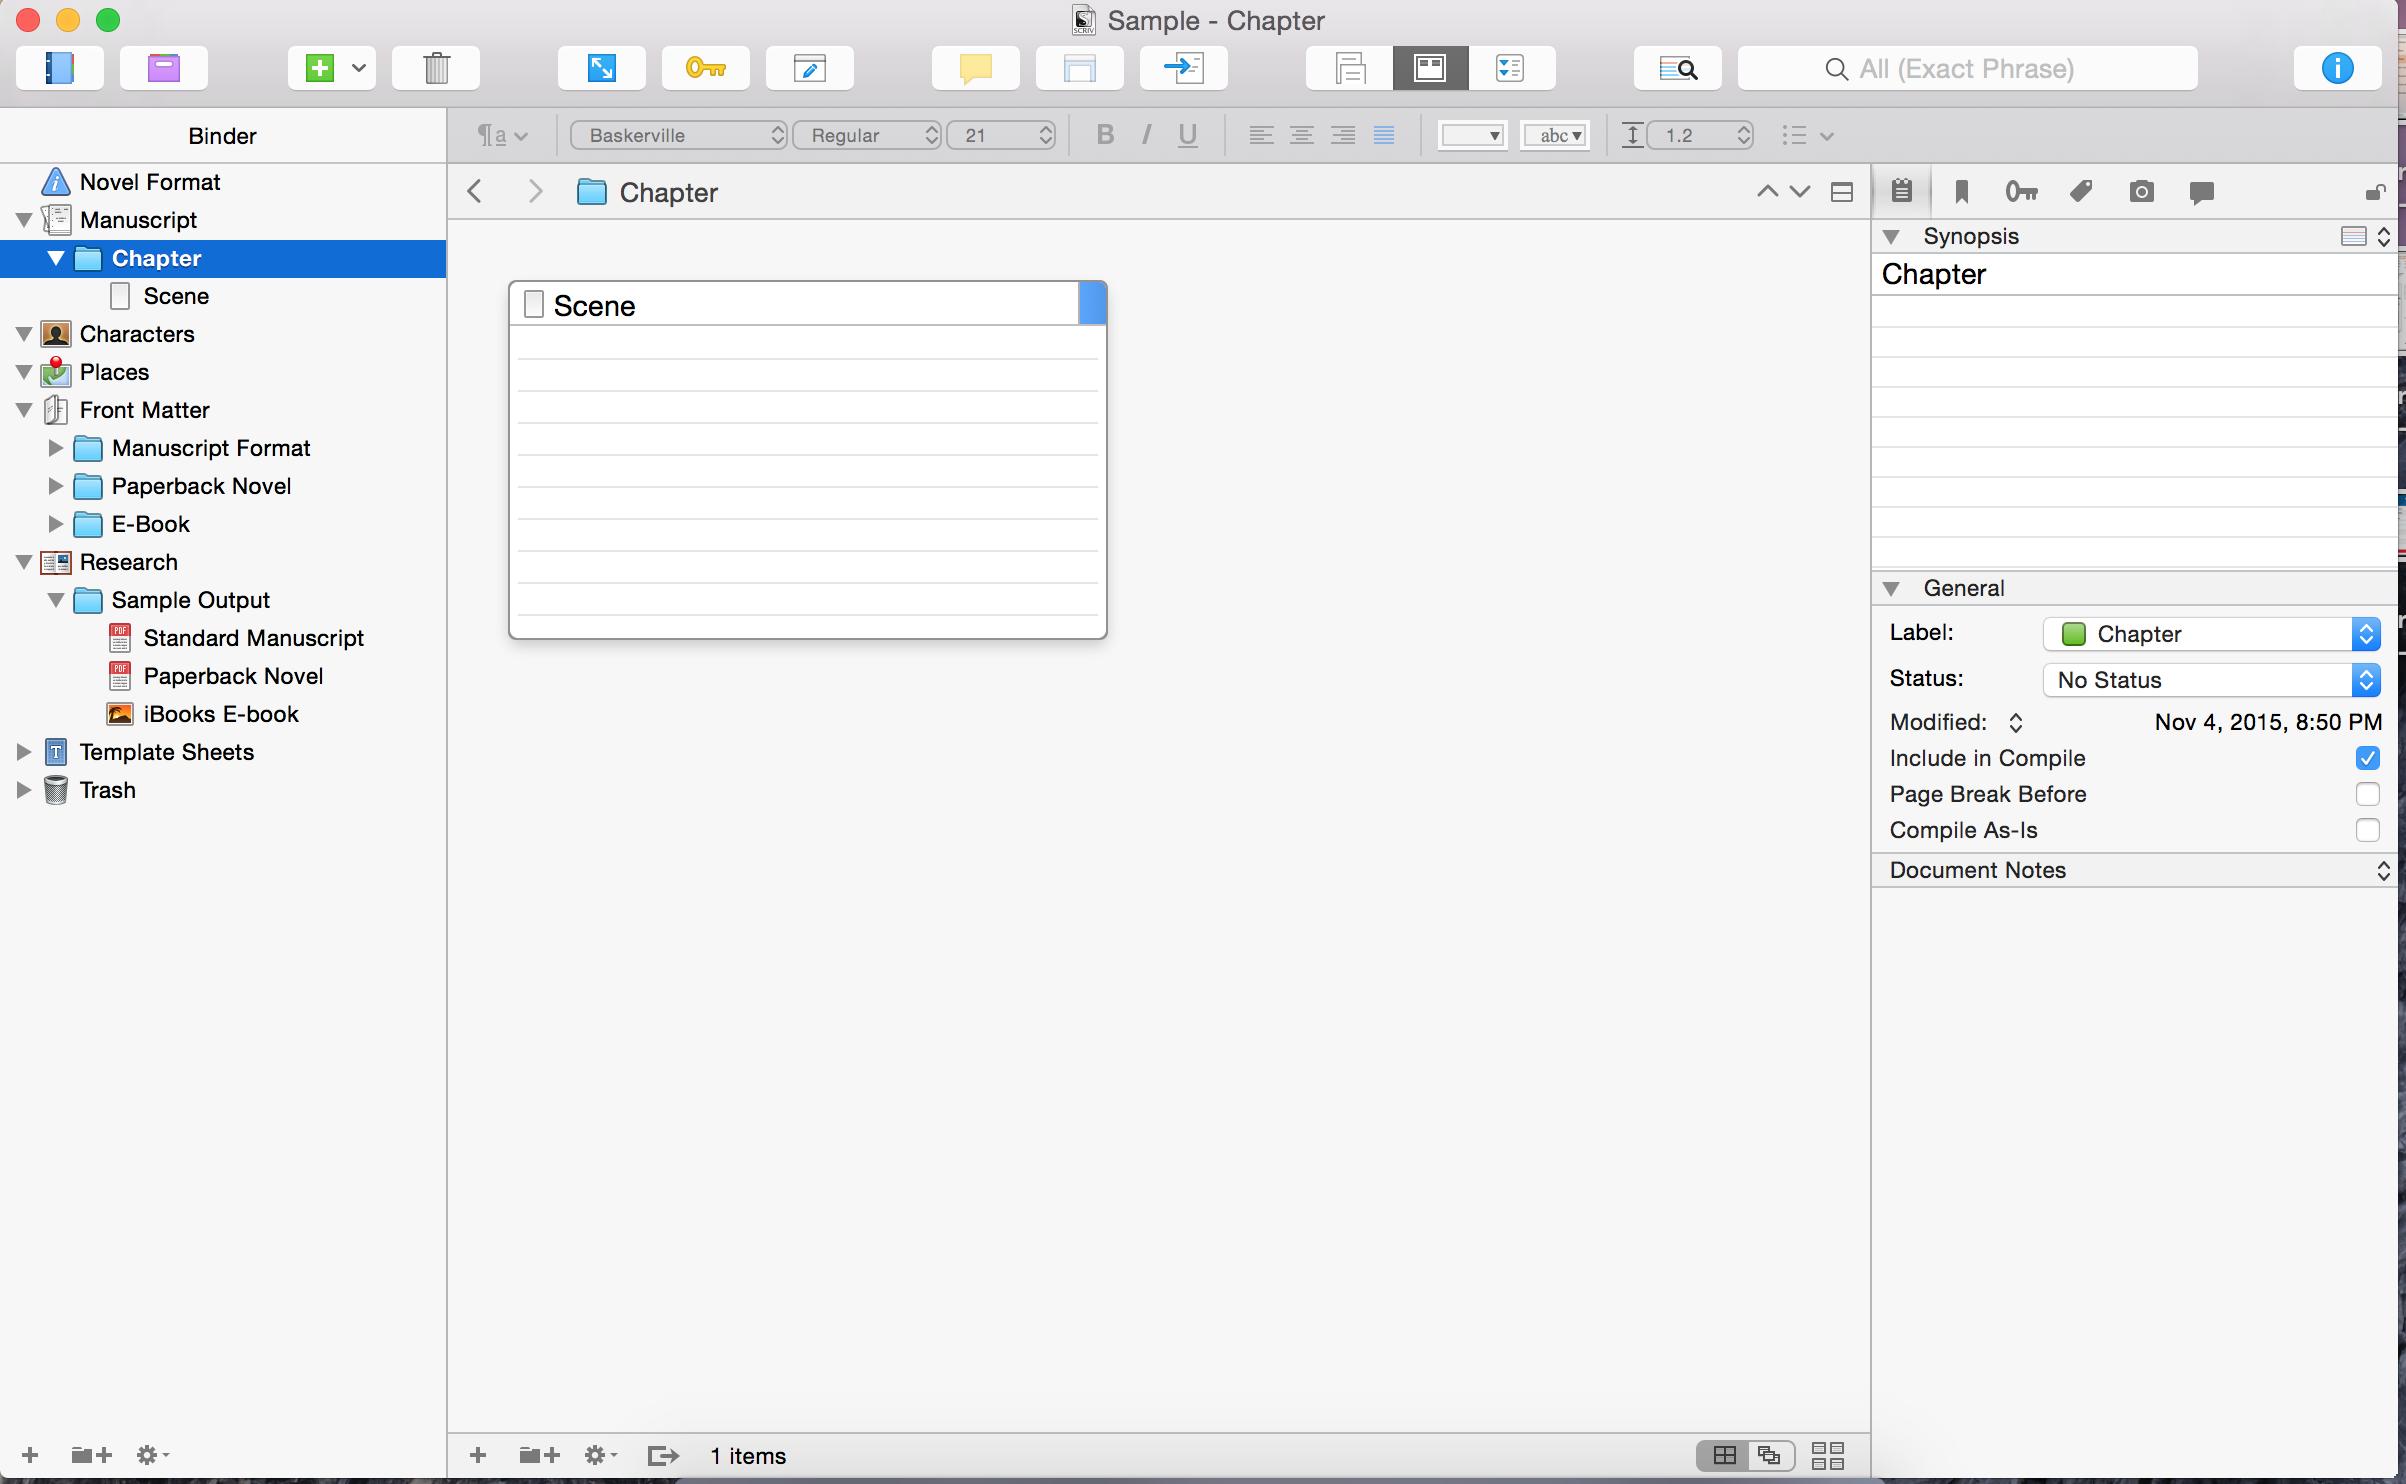 Scrivener empty document